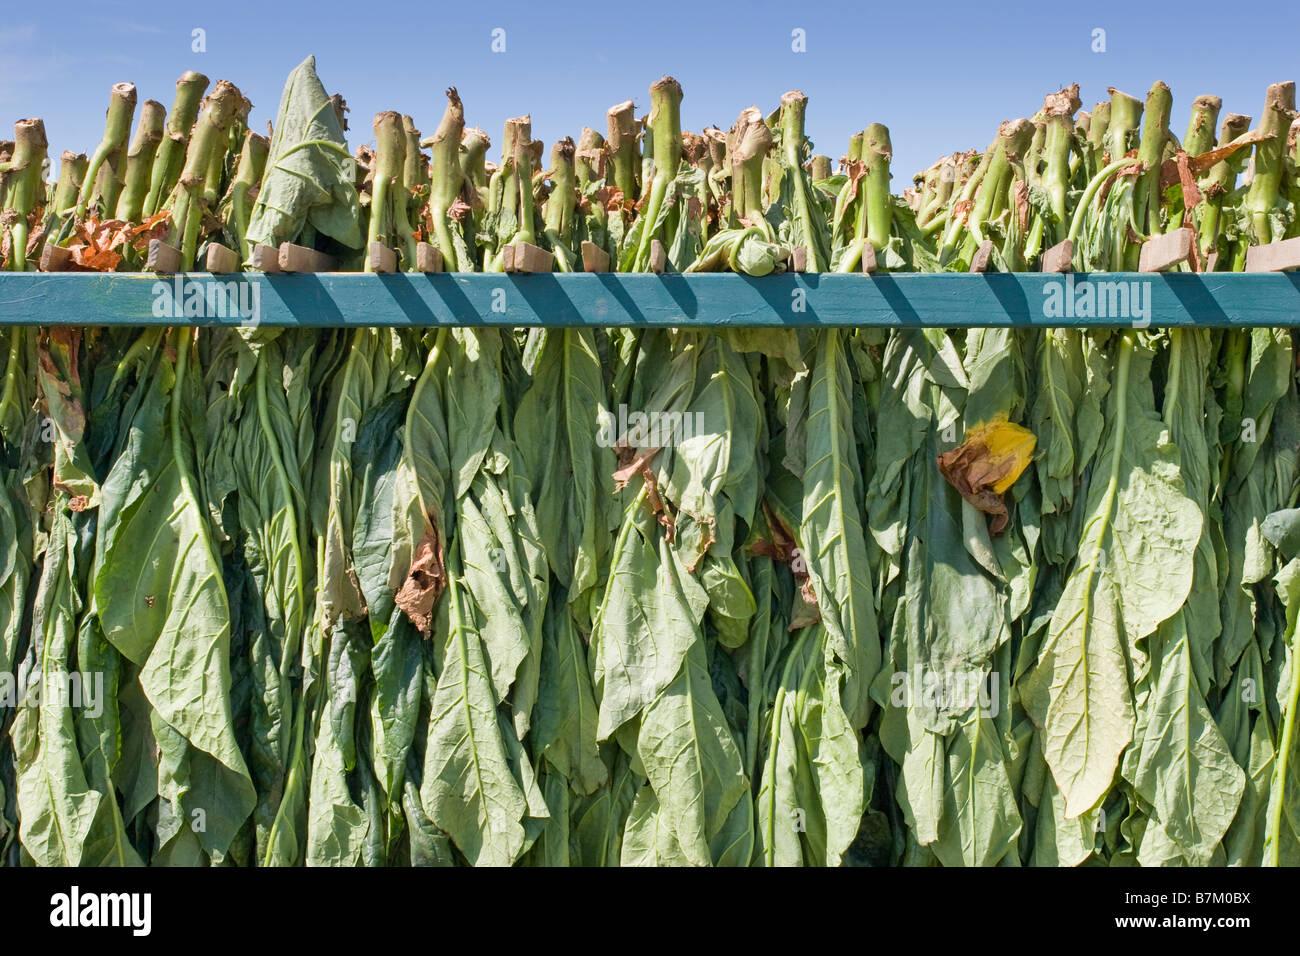 Tobacco harvest in Canada - Stock Image